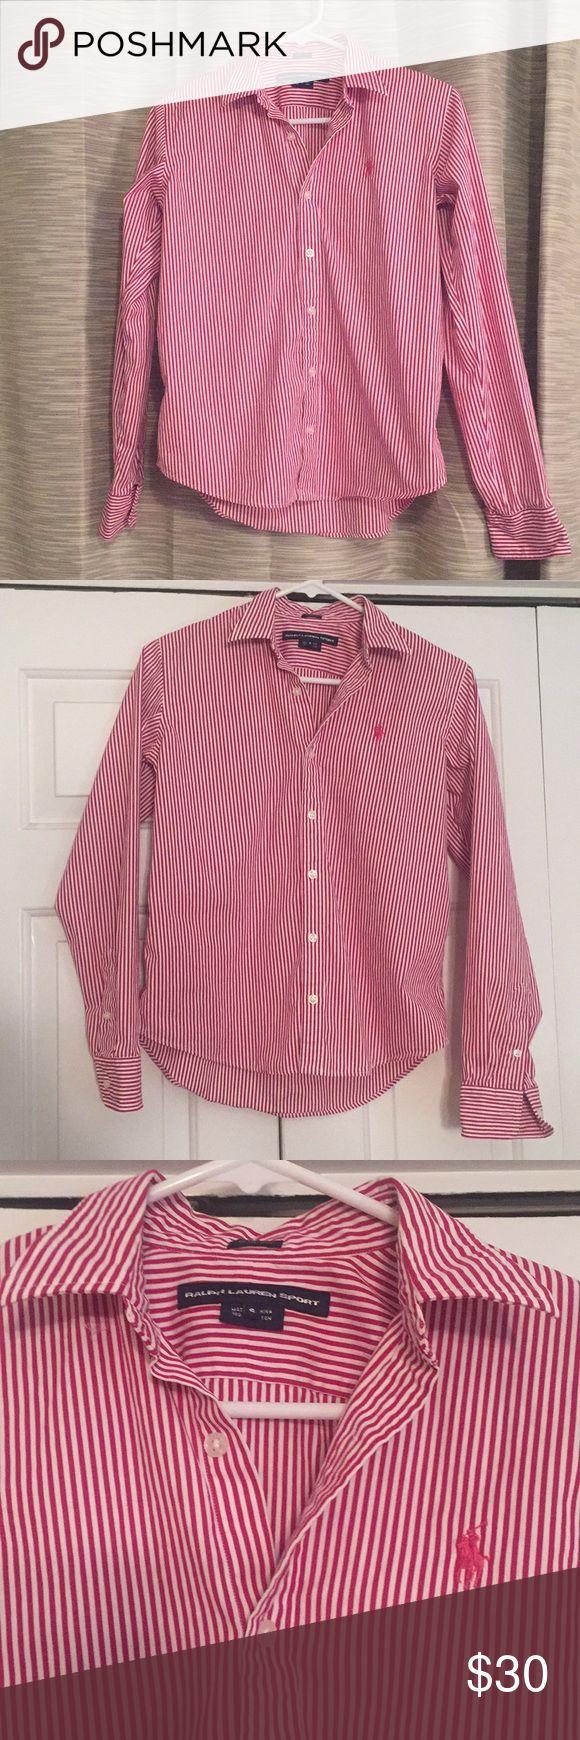 Dark Pink Striped Ralph Lauren Dress Shirt Great for the office. Dark pink & white button down dress shirt. Size 6. Ralph Lauren. Feminine slim fit. Worn once. Dark pink polo horse. Ralph Lauren Tops Button Down Shirts